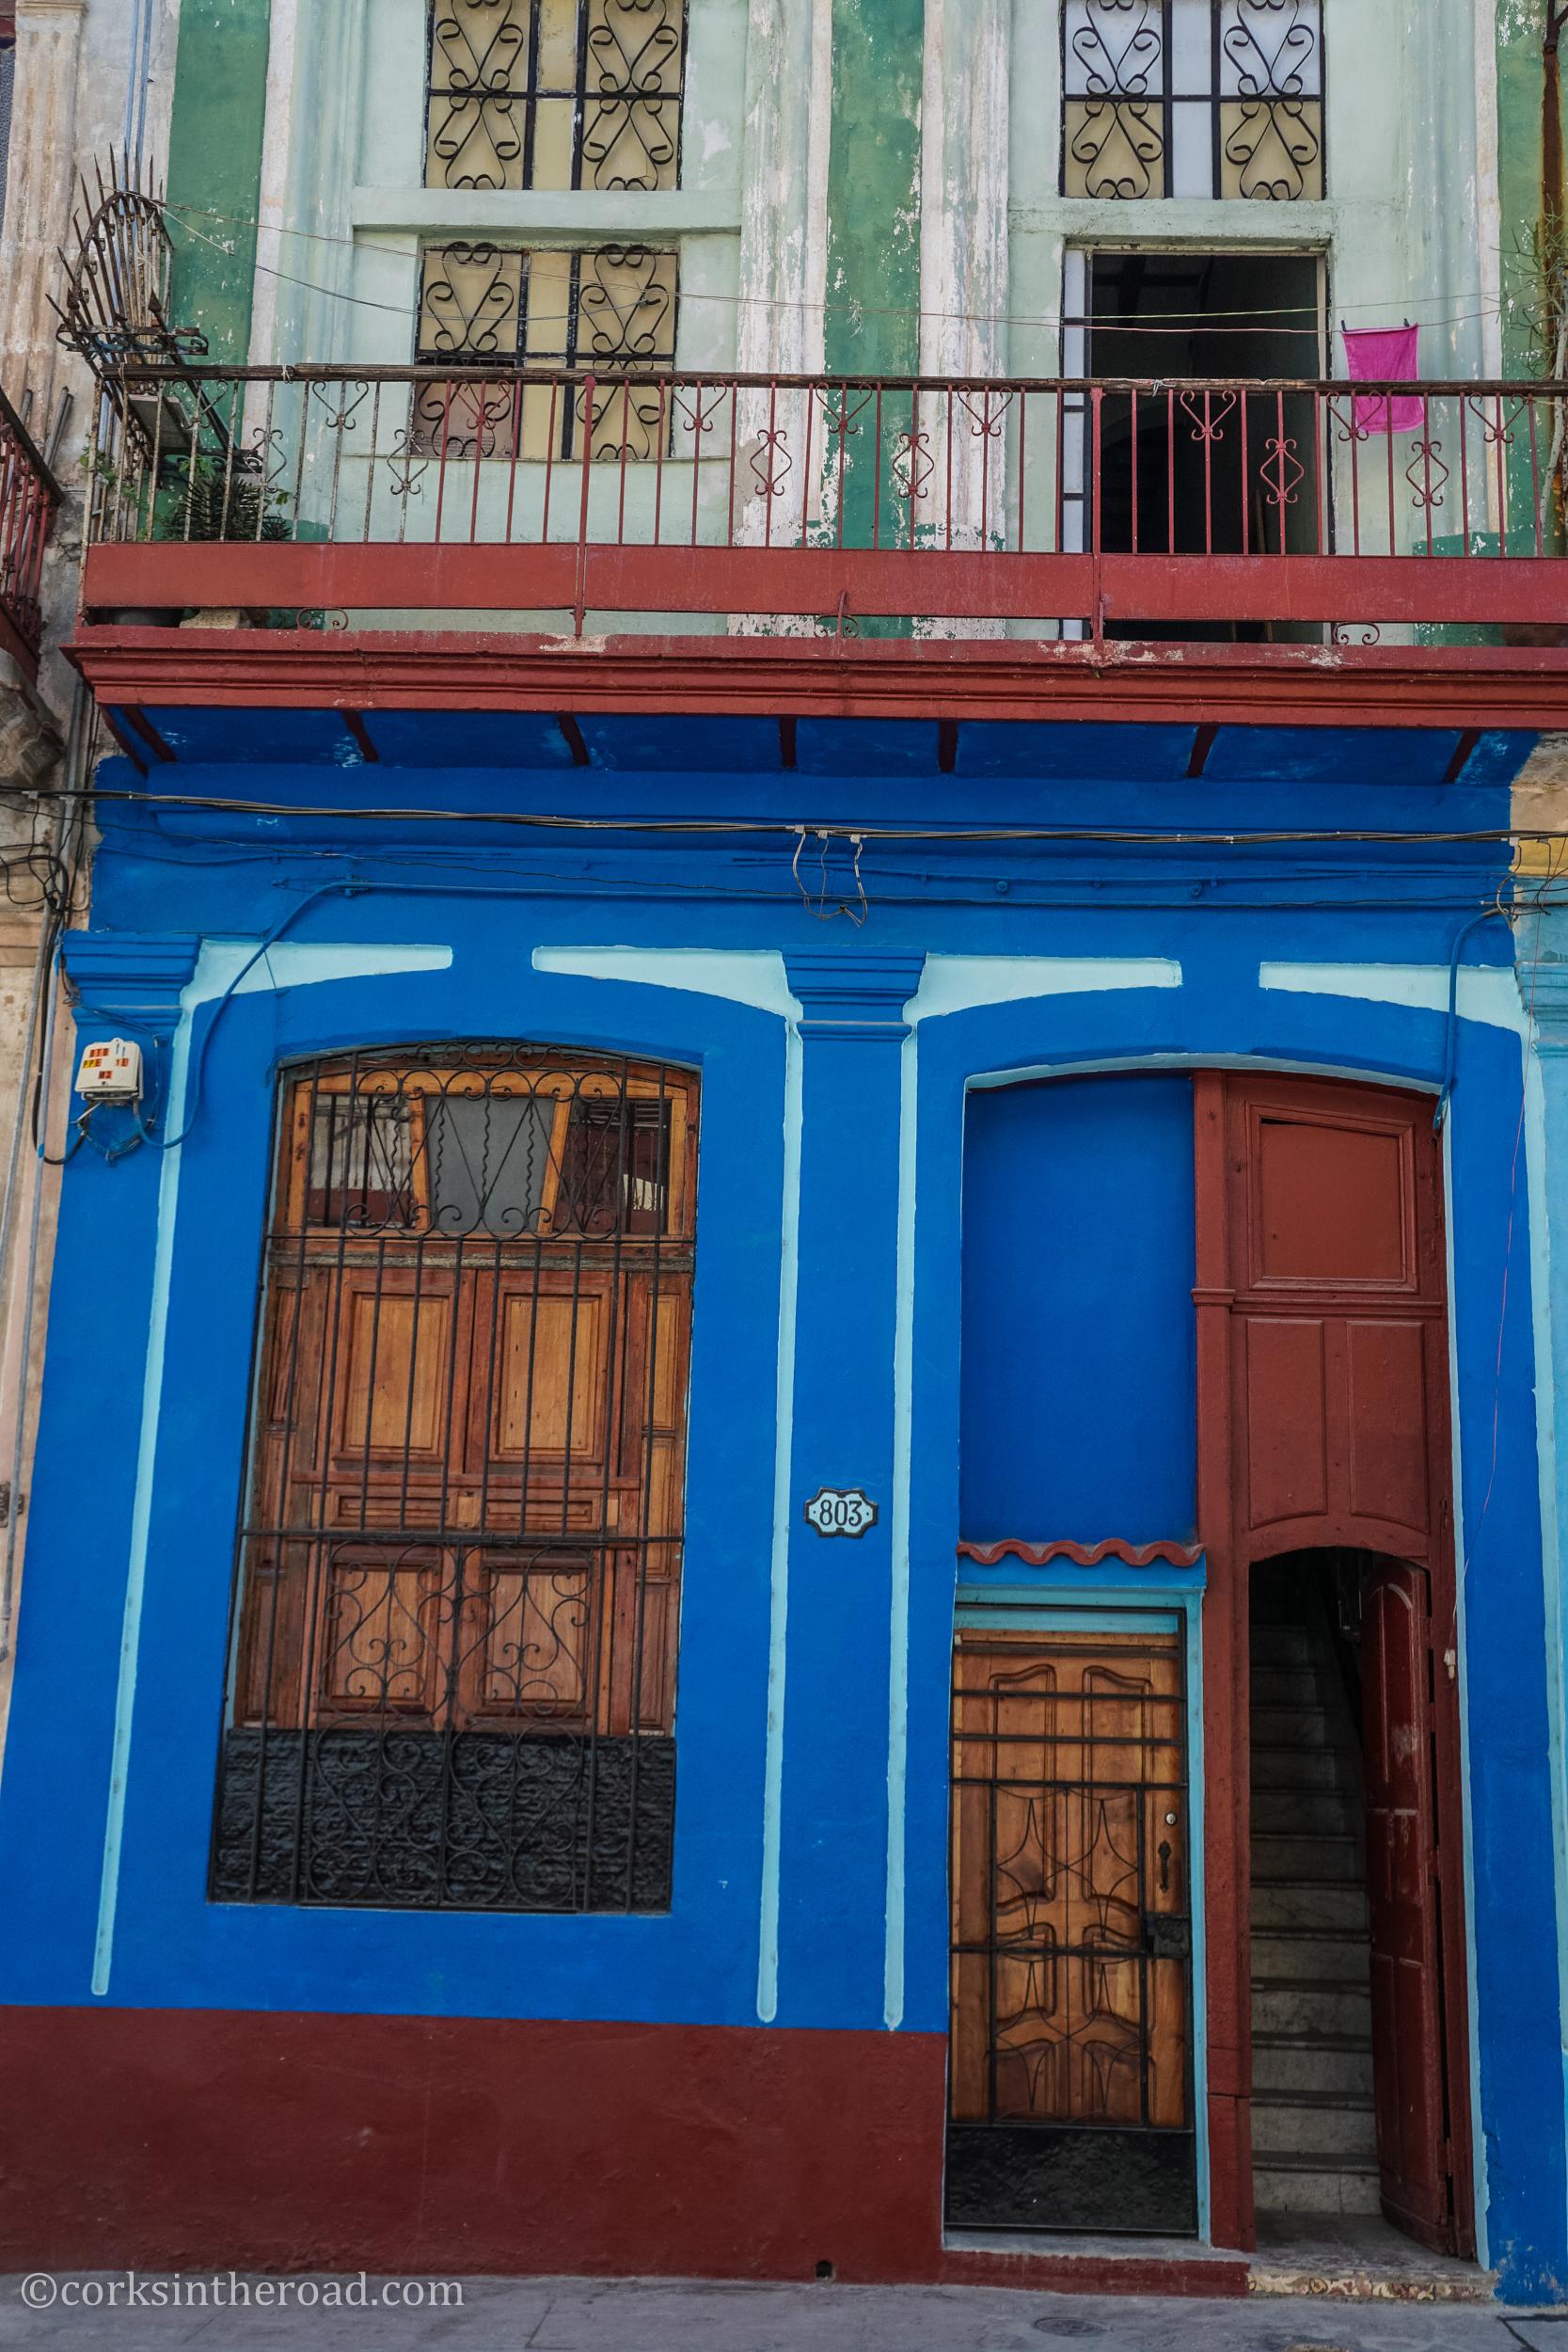 Architecture, Corksintheroad, Cuba, Havana-13.jpg